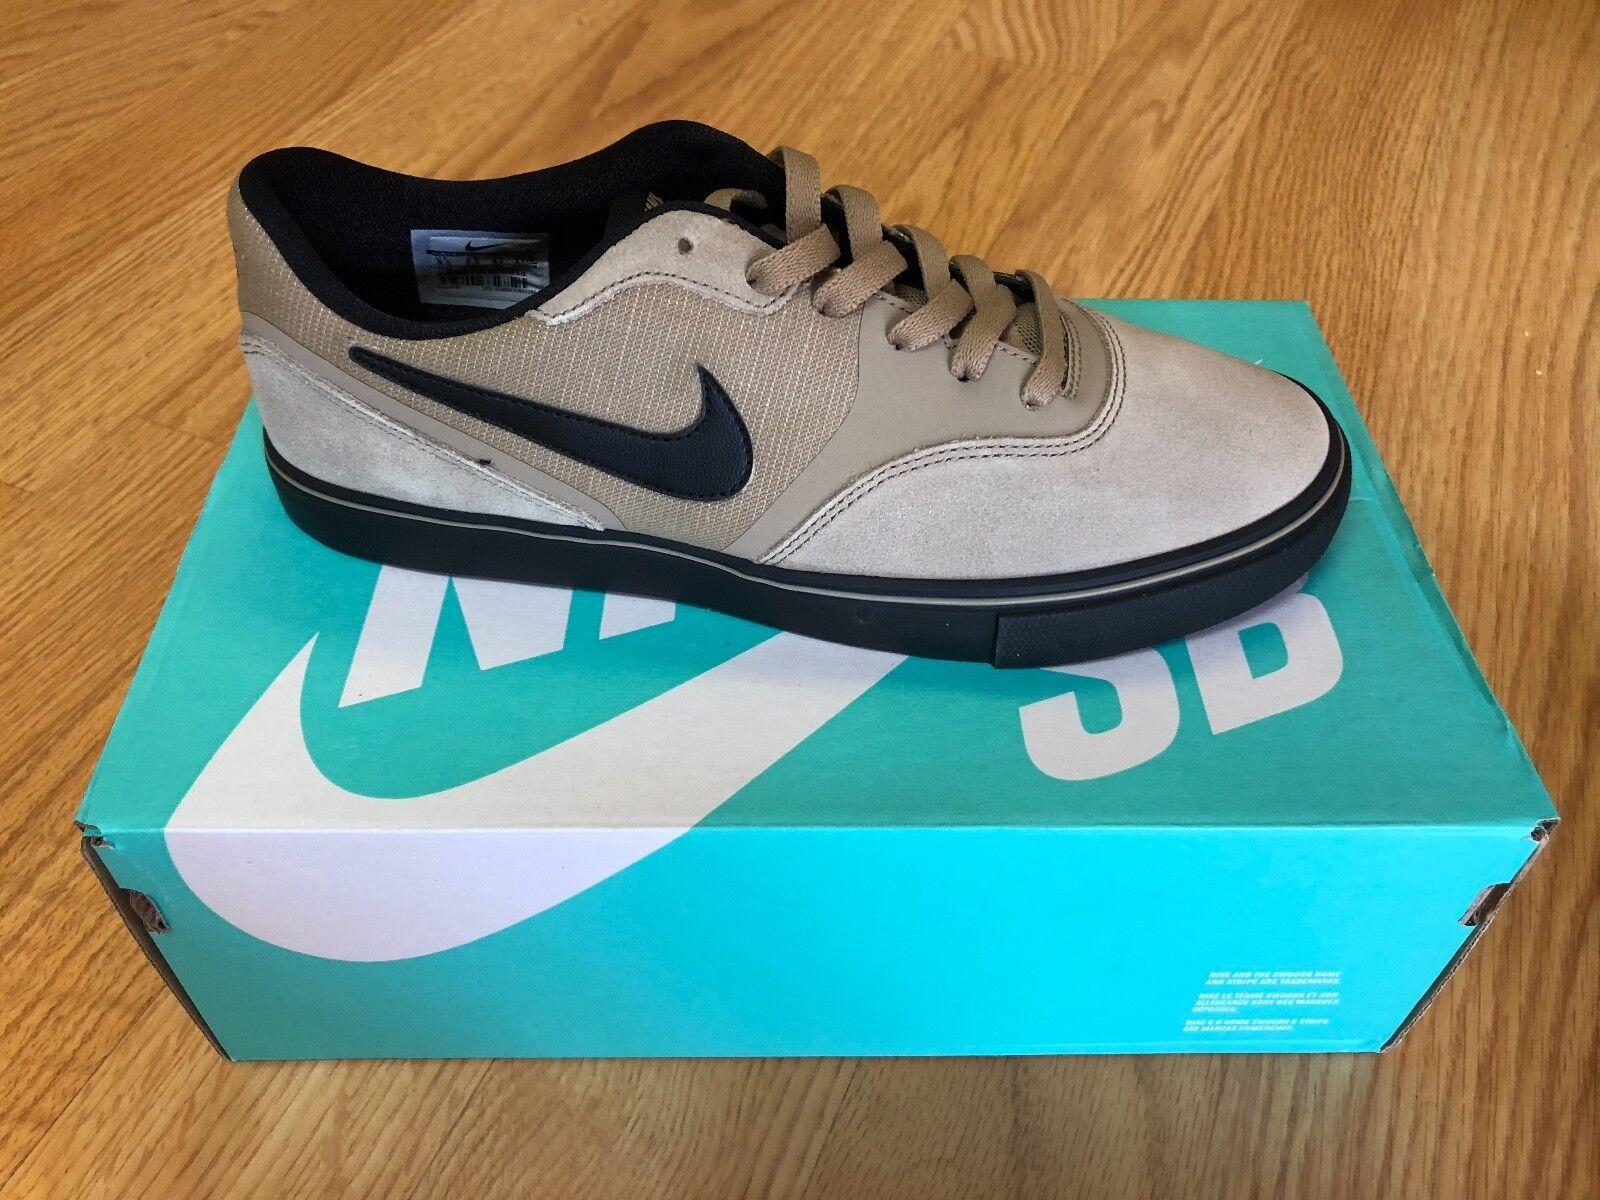 Nike SB Paul Rodriguez 9 VR sz 9.5 Rare,Sample,QS, skateboard,TZ,Janoski,Dunk